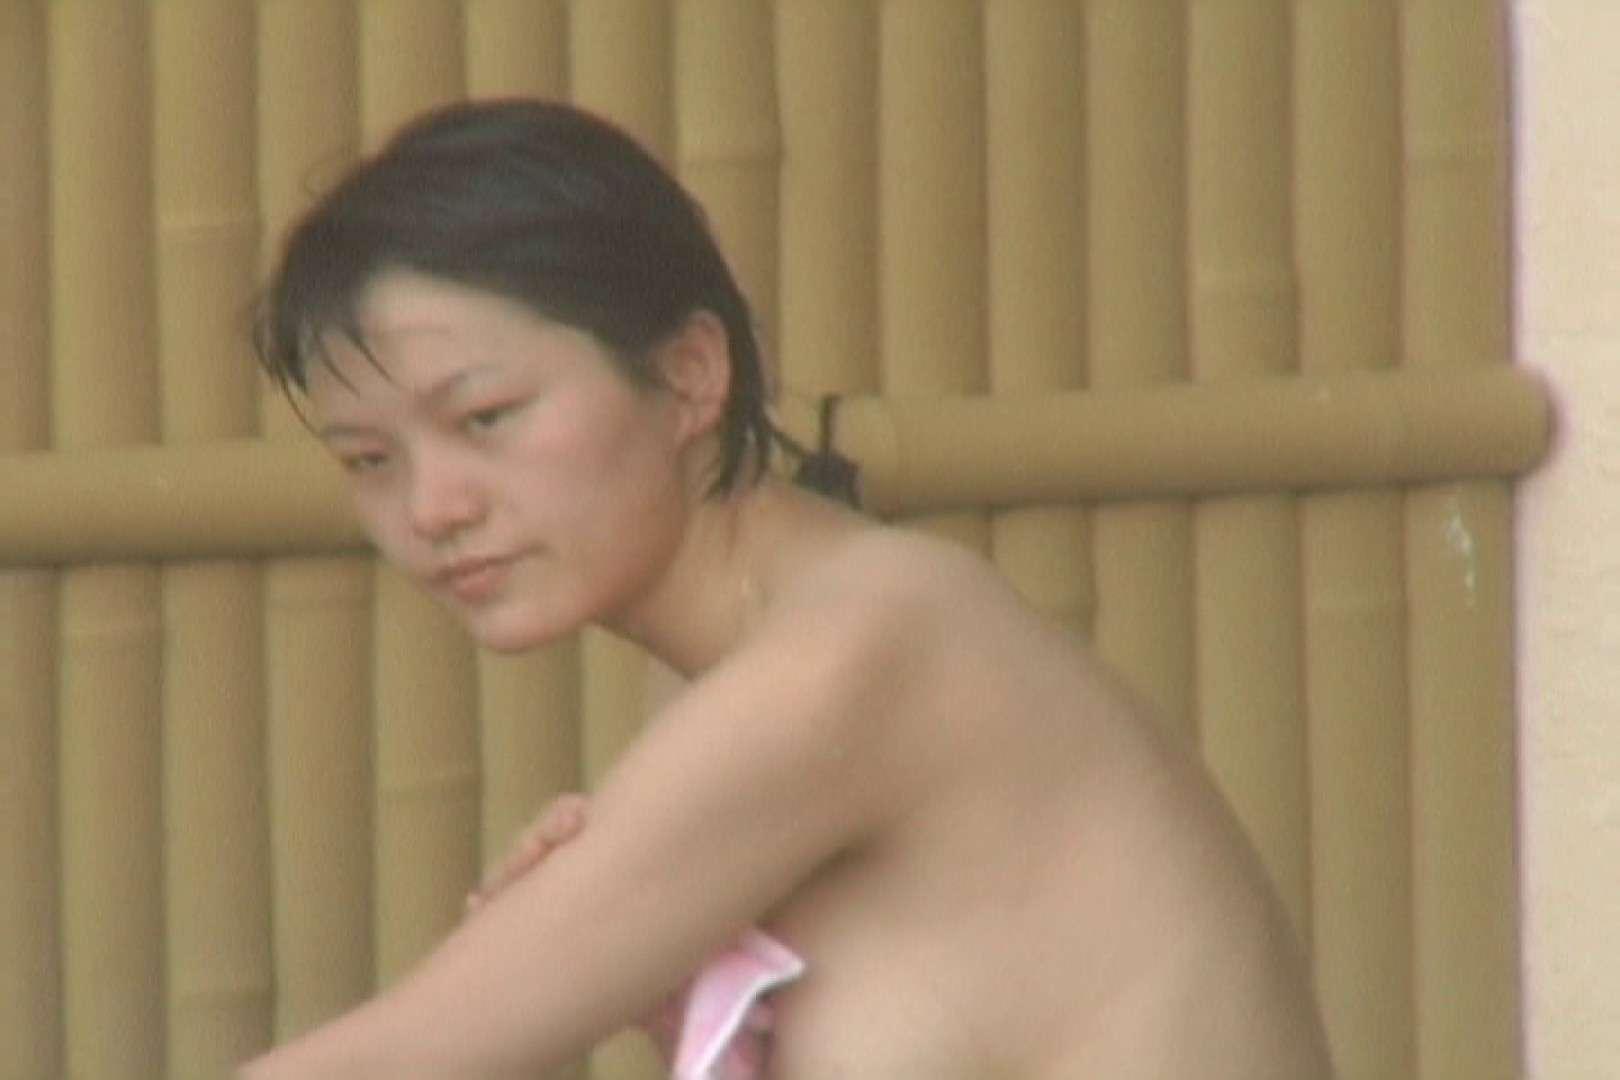 Aquaな露天風呂Vol.116 盗撮映像  42Pix 34